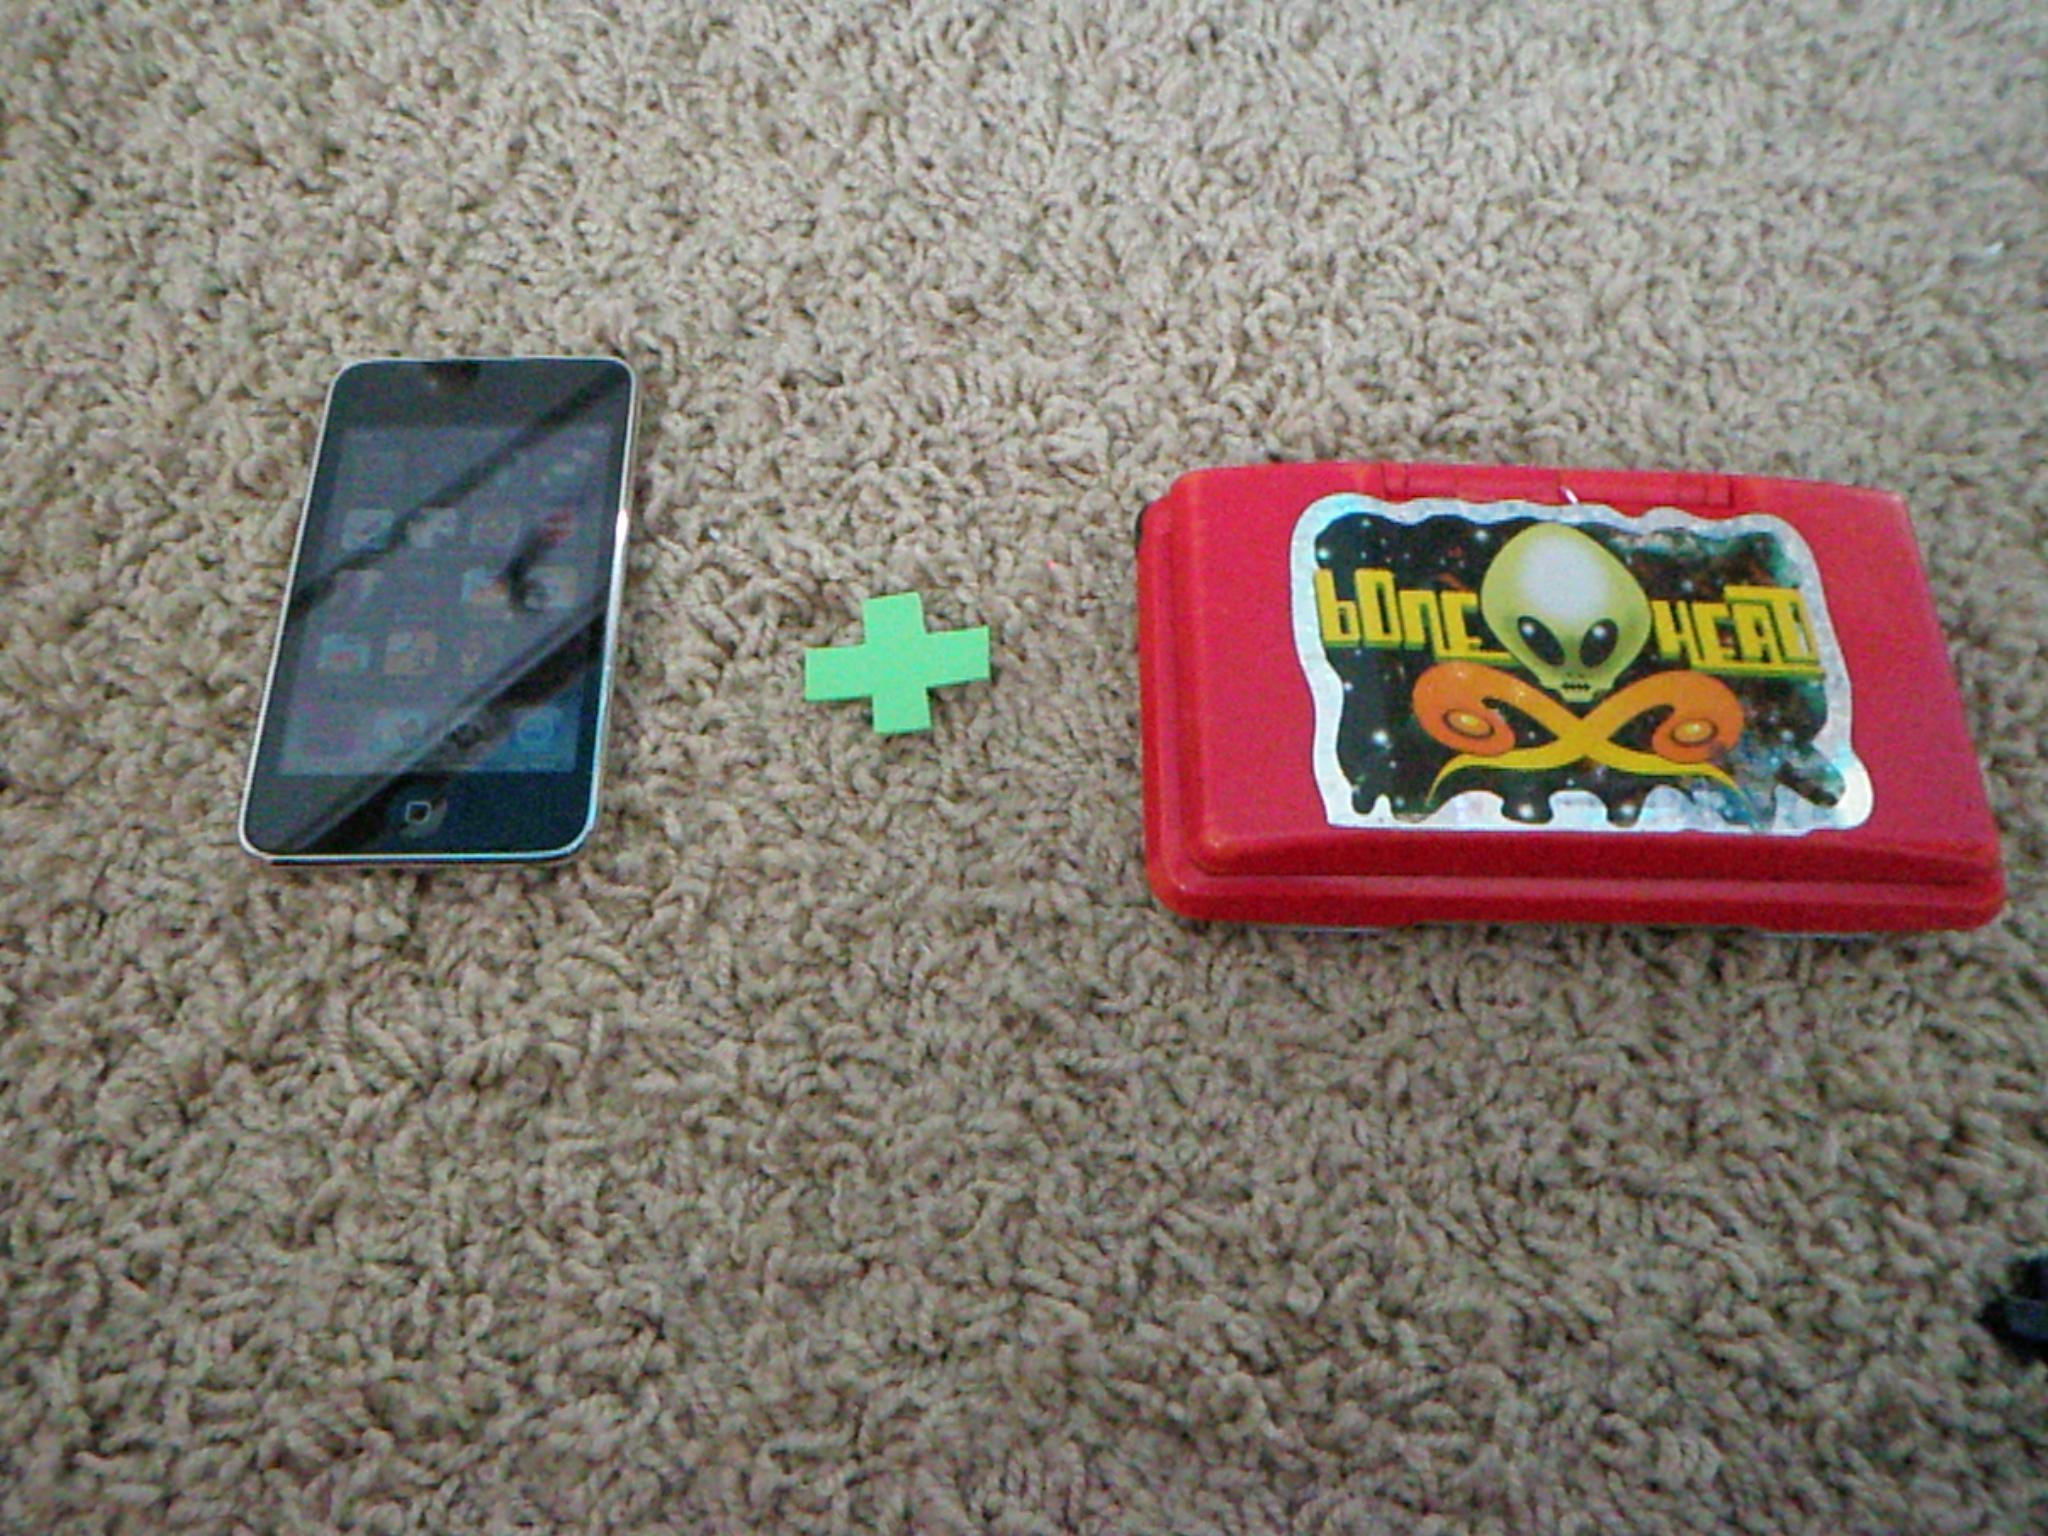 Nintendo DS Ipod Case (DSI)